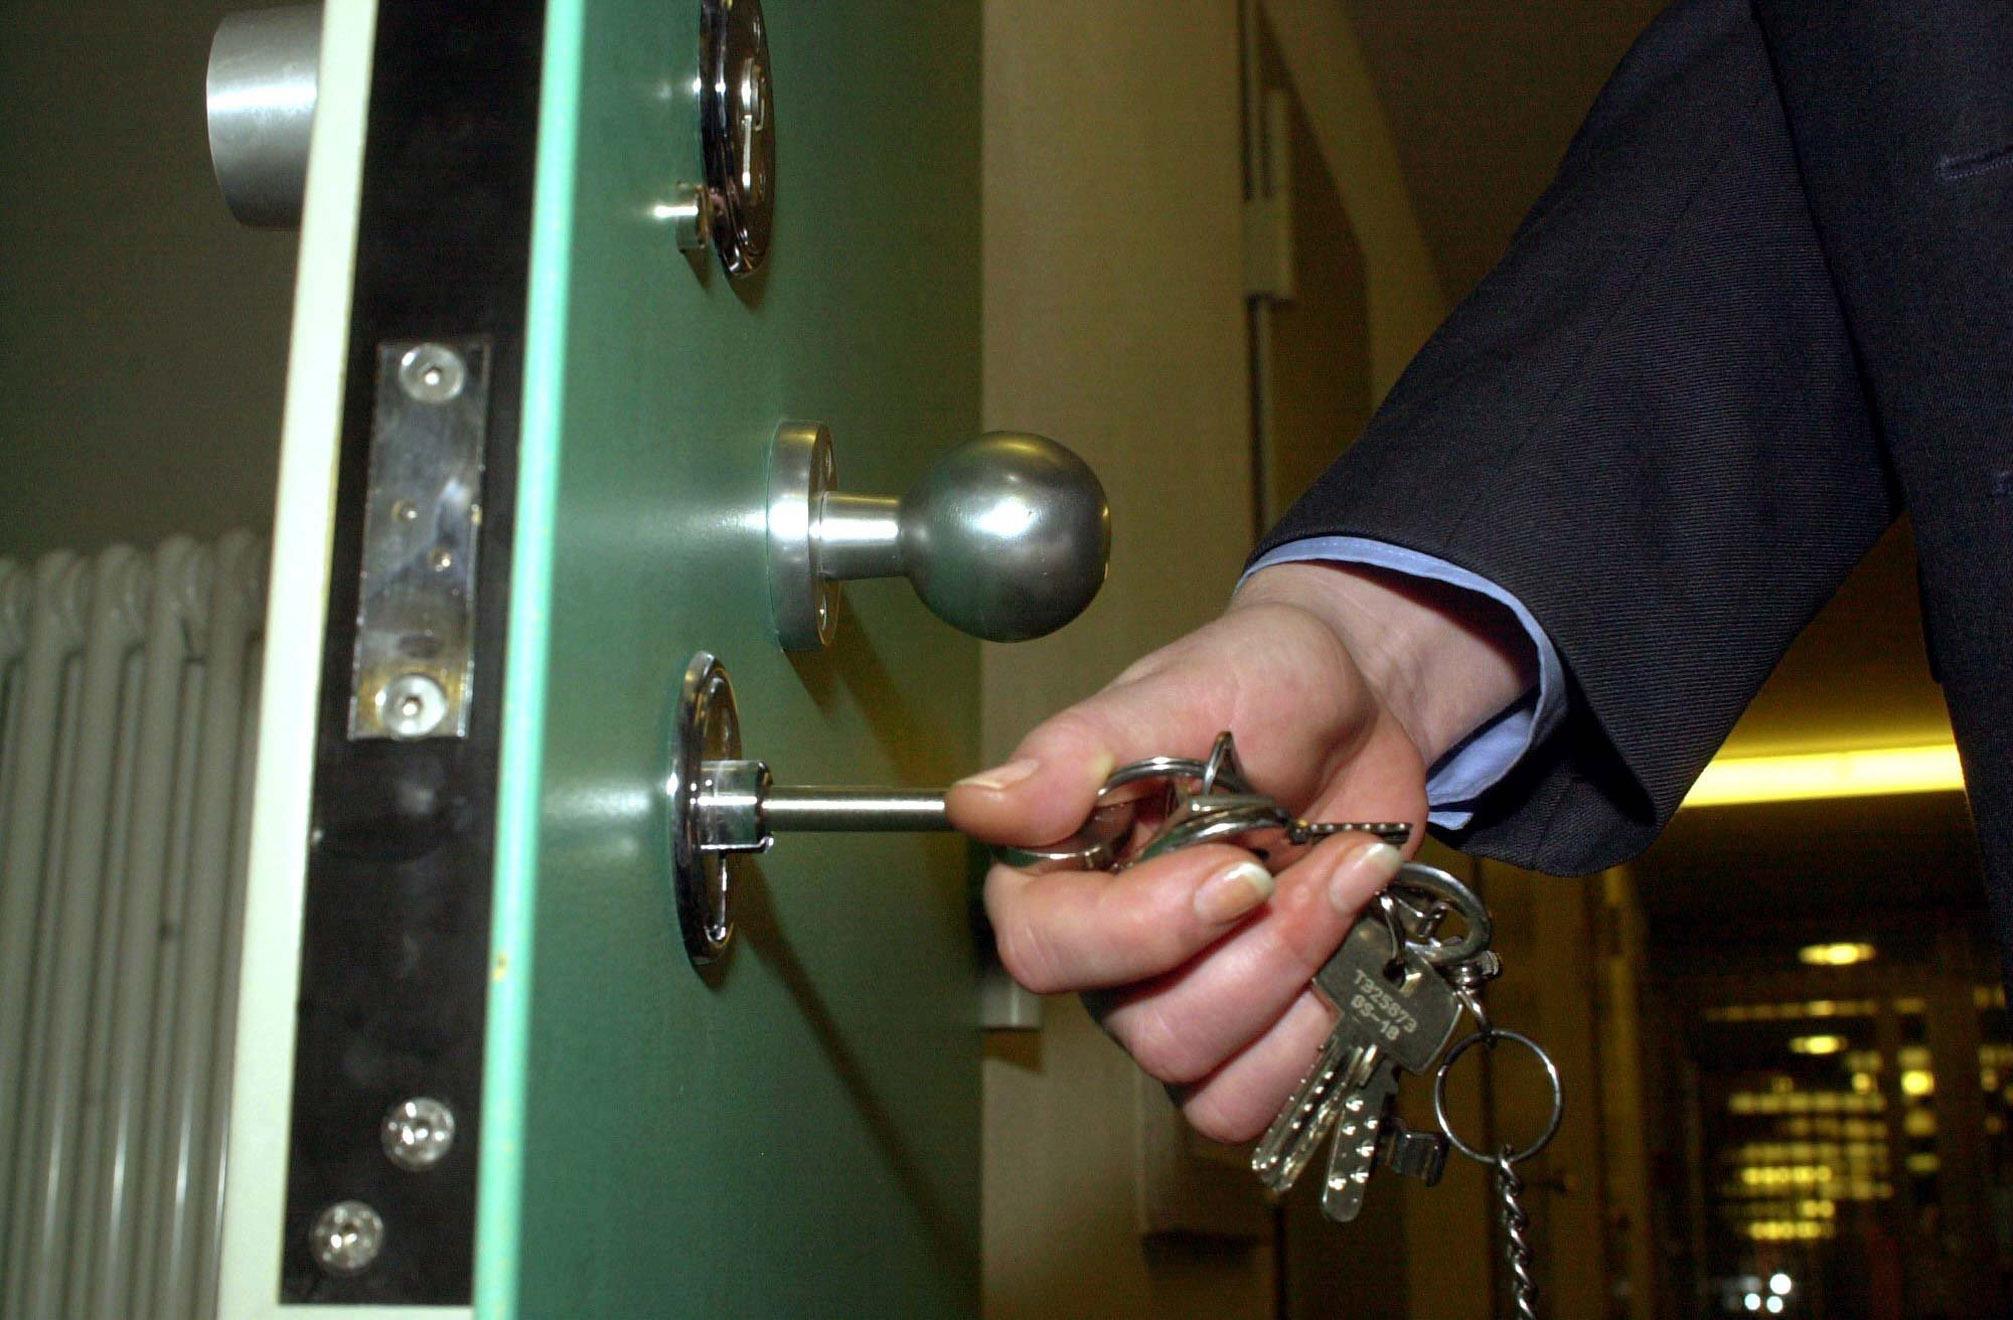 An officer closes a prison door